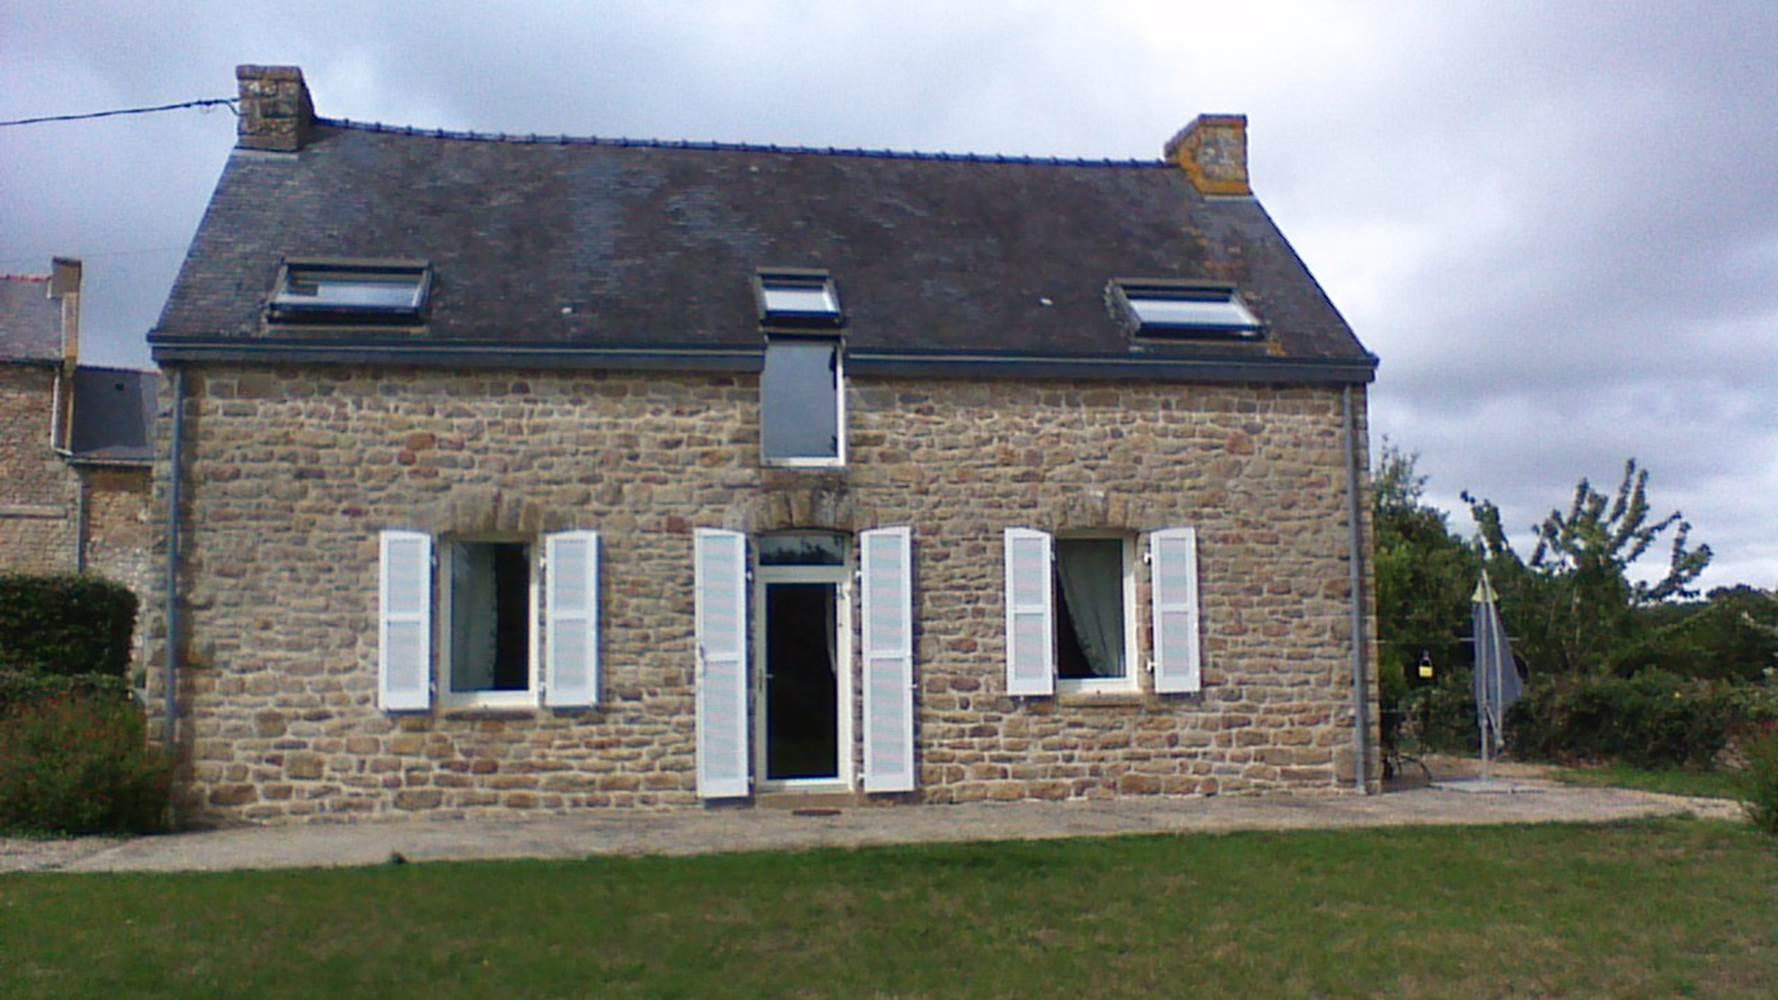 Gîte n°56G4644 – CRACH – Morbihan Bretagne Sud © GITES DE France 56